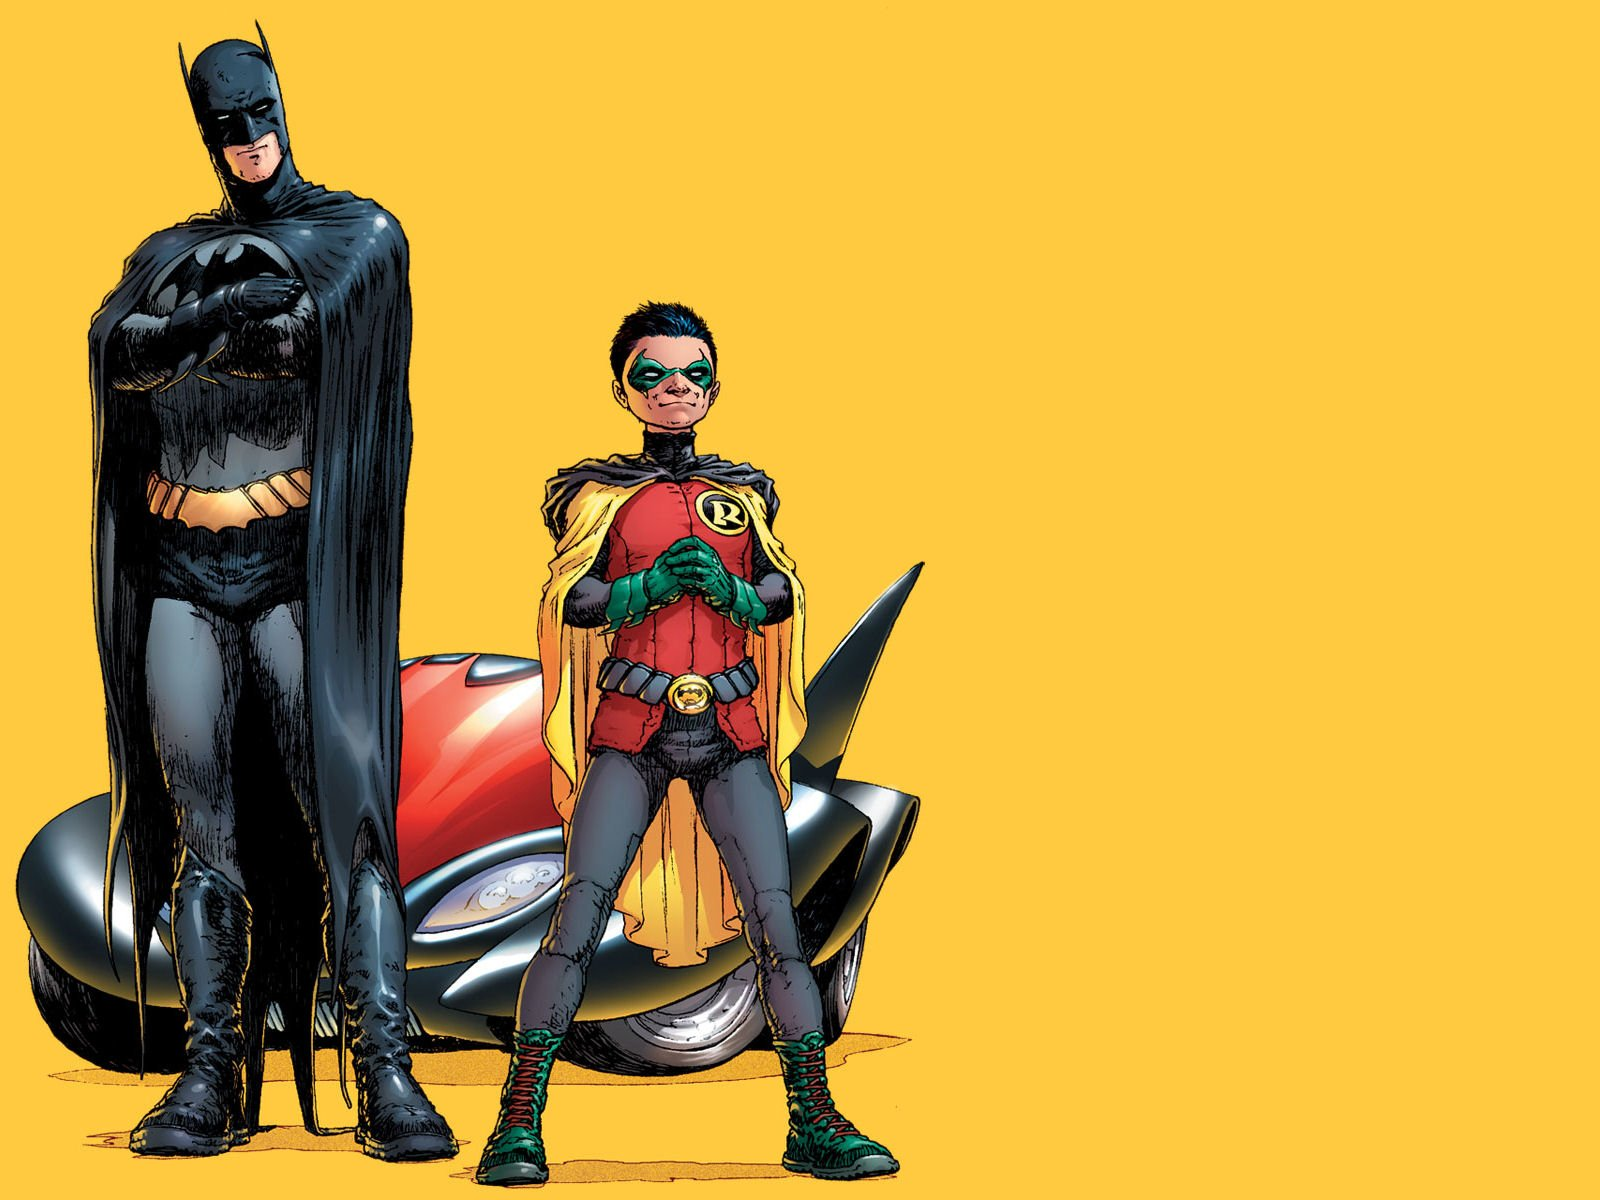 Batman robin wallpaper and background image 1600x1200 id 660897 wallpaper abyss - Image de batman et robin ...